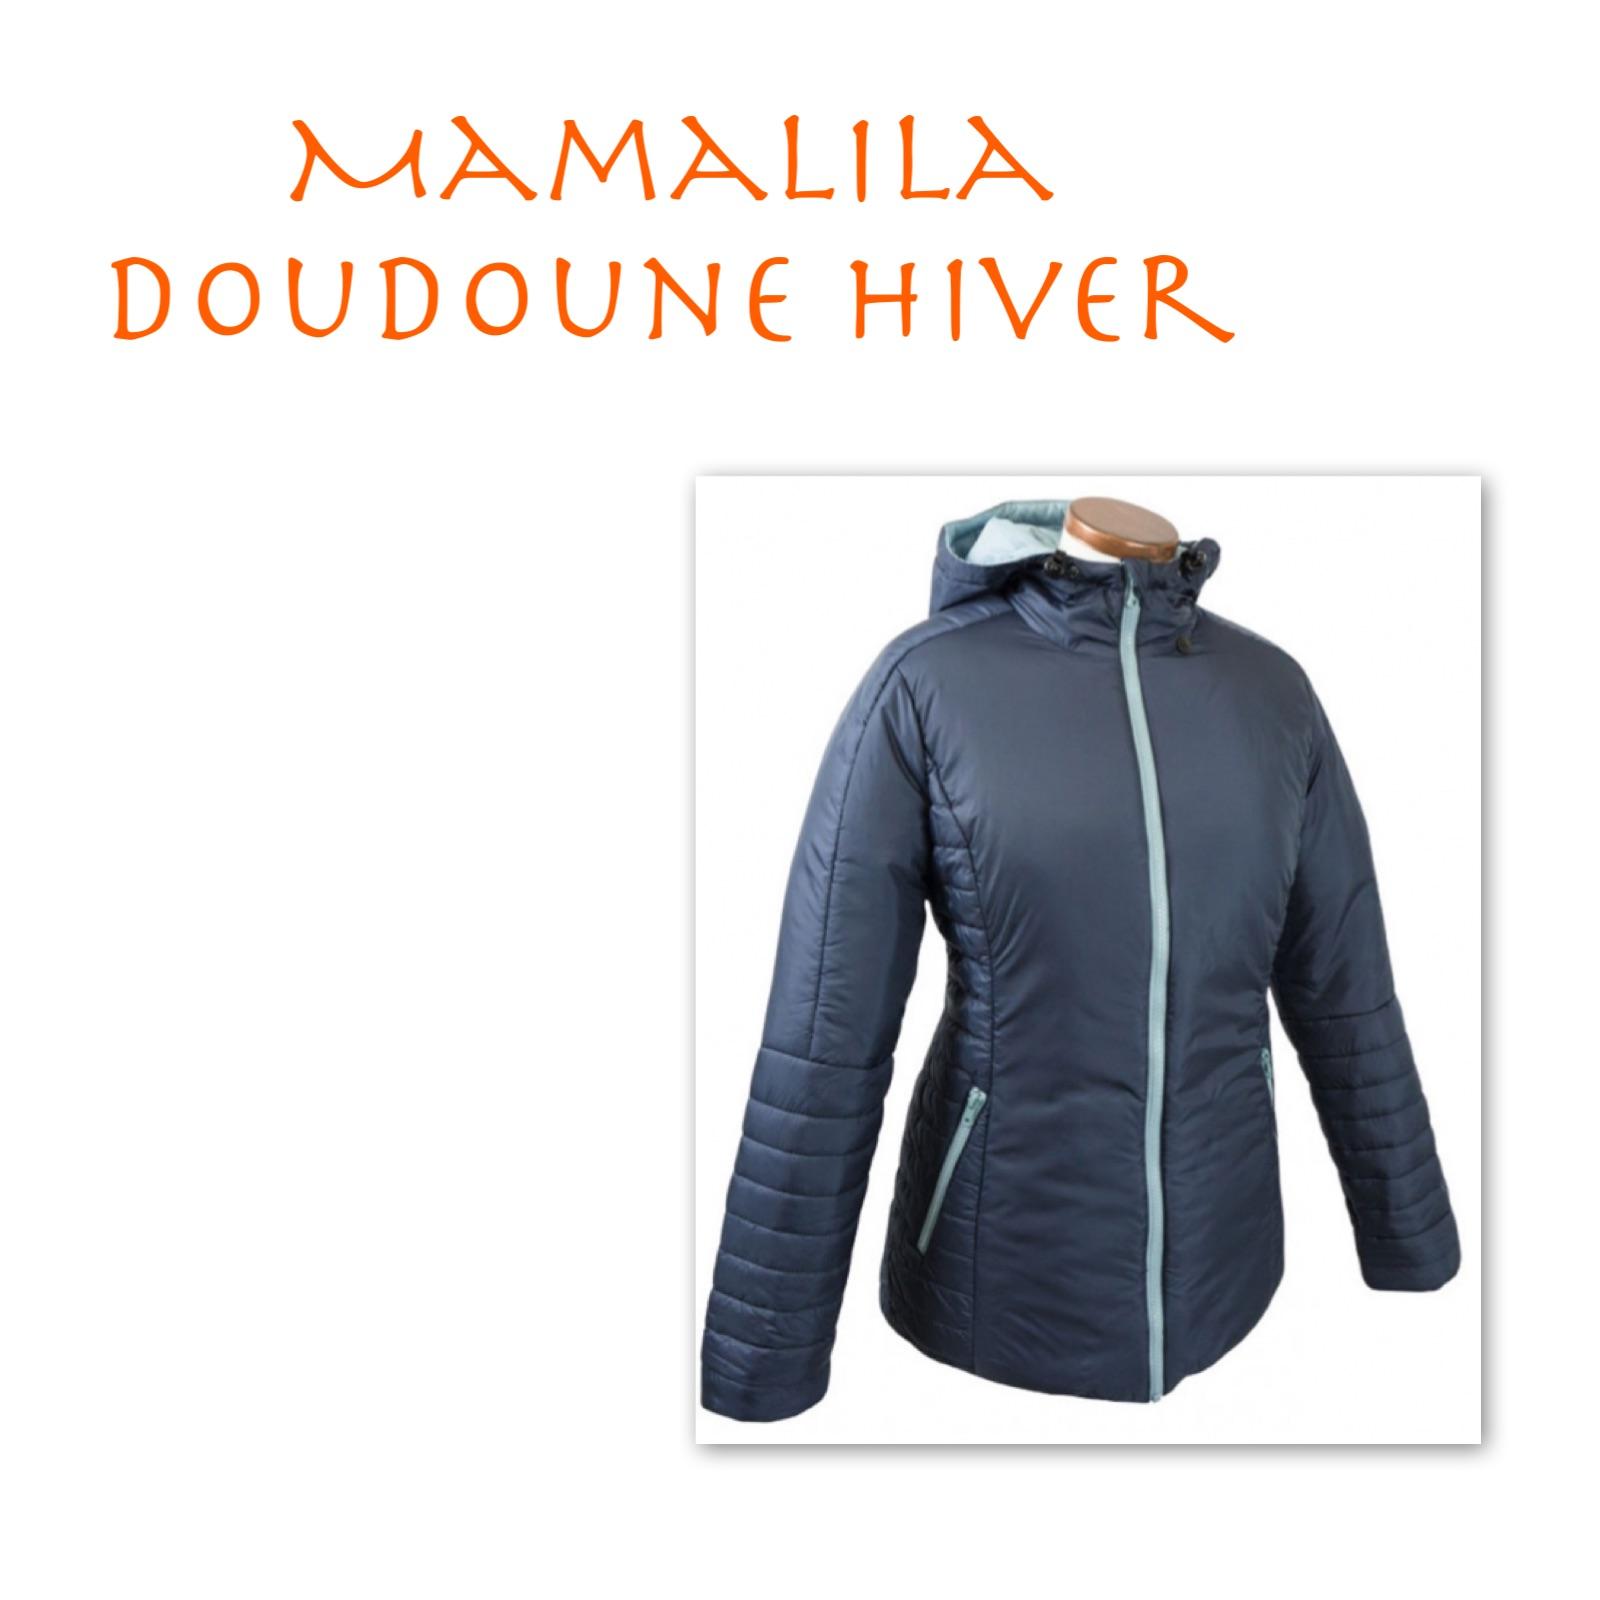 Mamalila Doudoune hiver